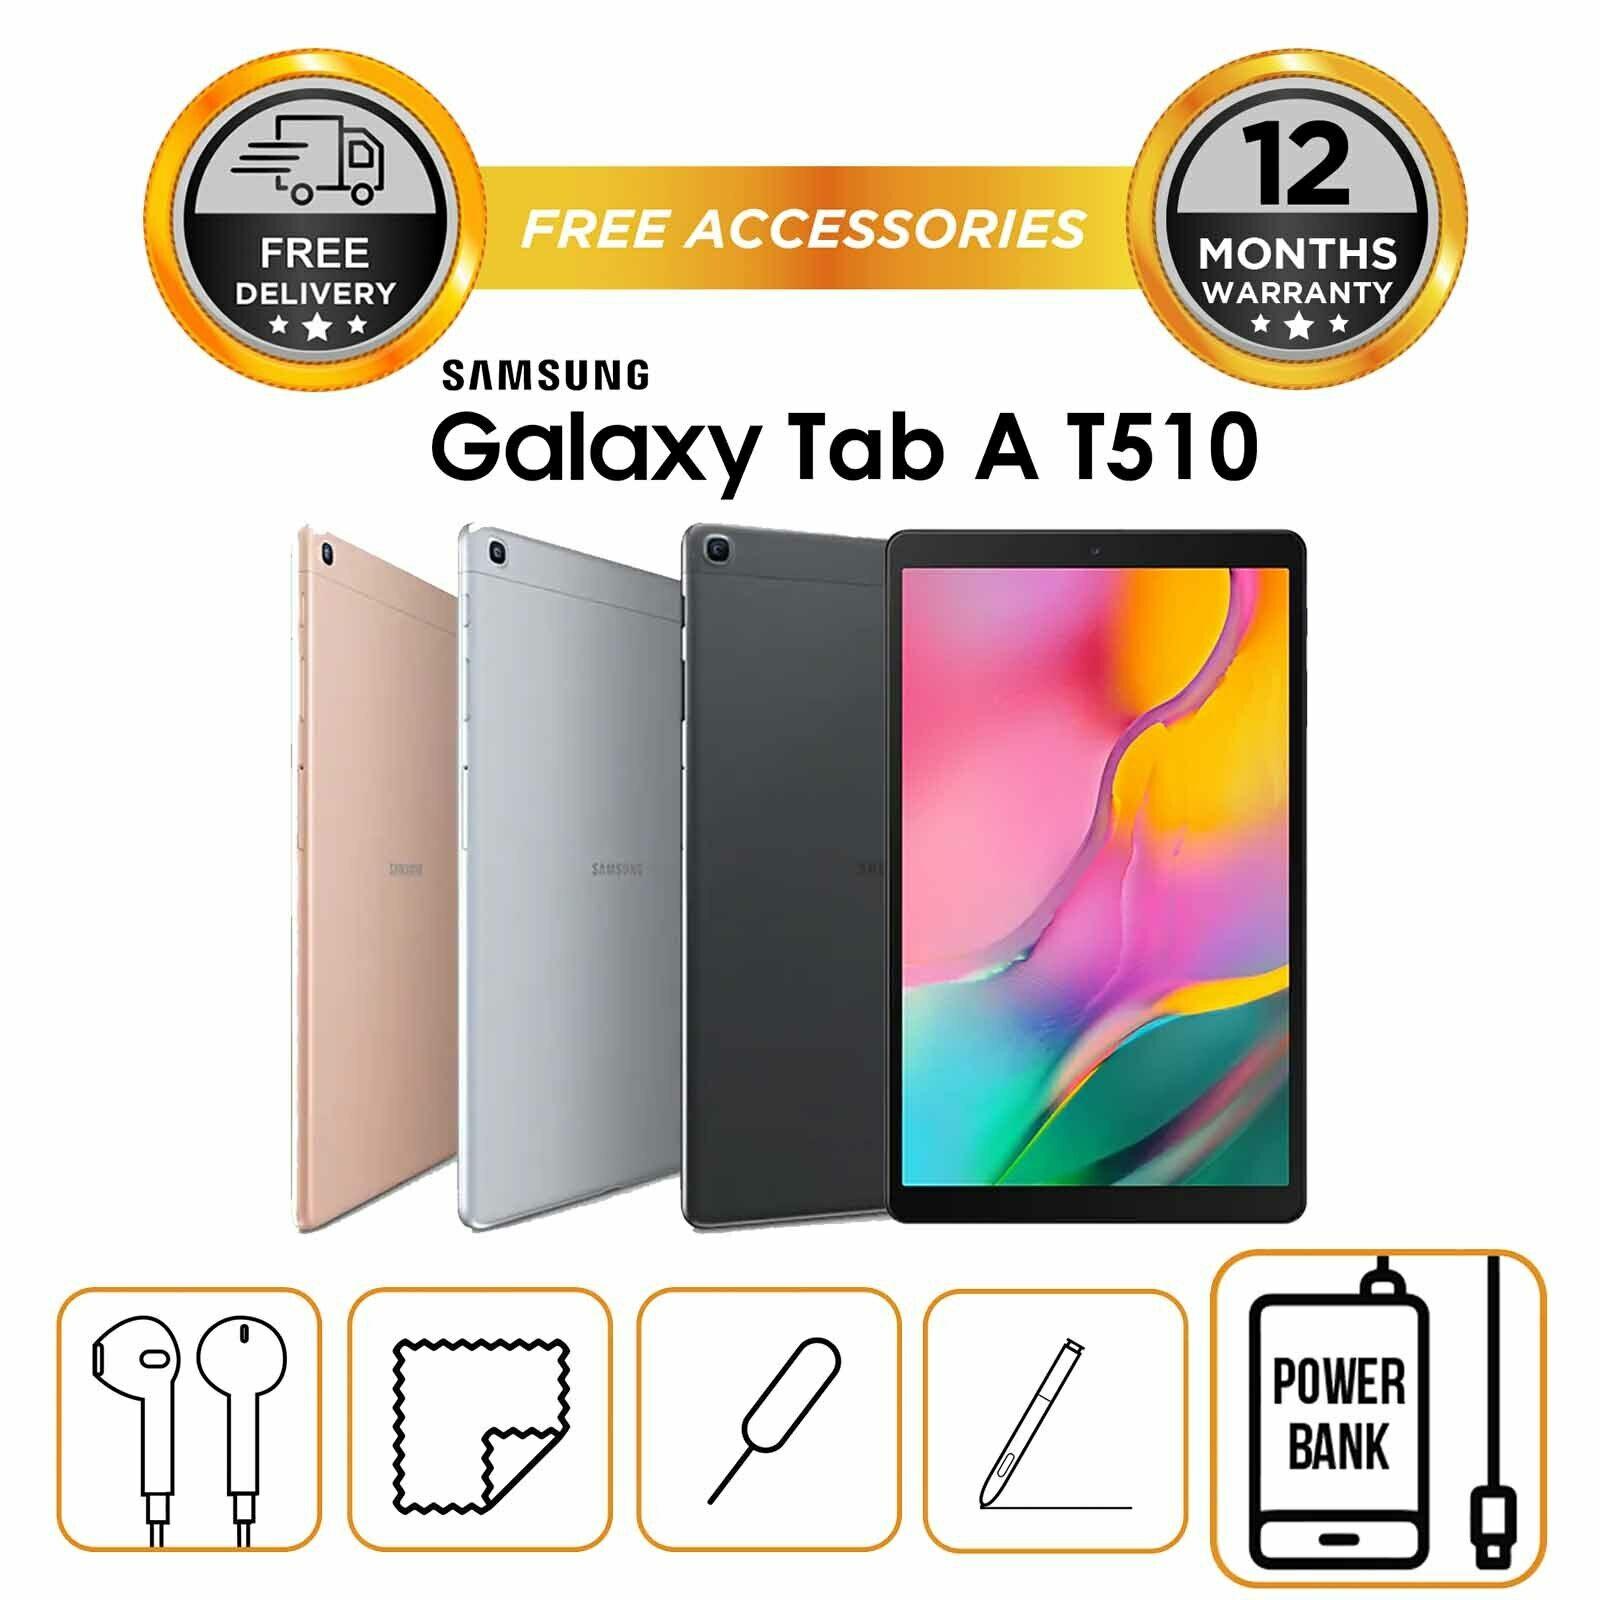 Samsung galaxy tab A 10.1 2019 with code £144.49 using code @ Hi-Techelectronicsuk / eBay